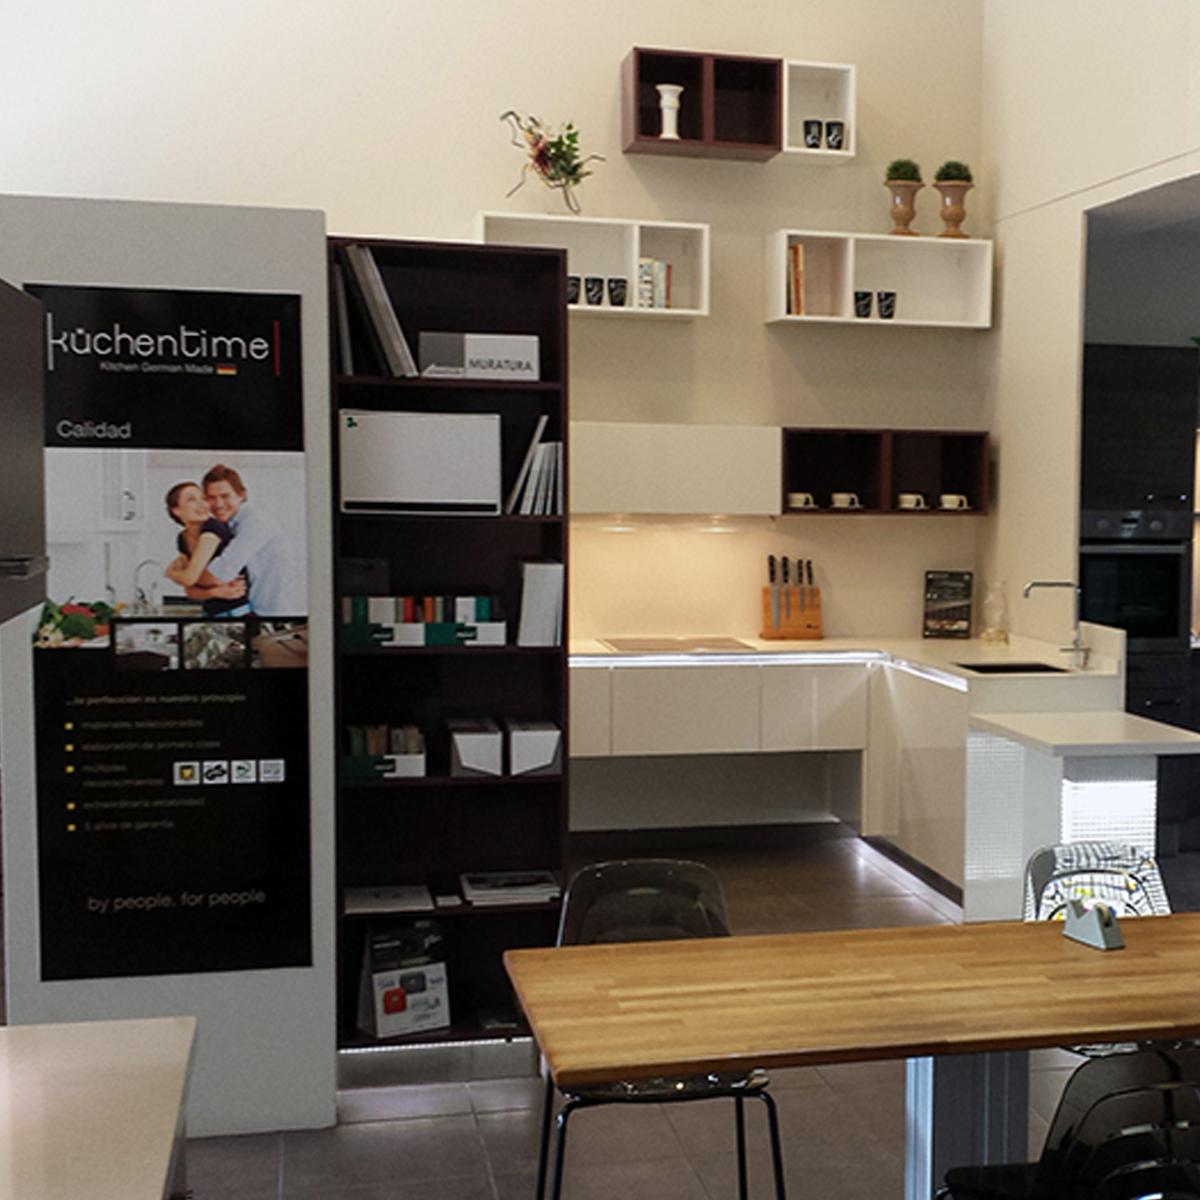 Casa Interior Inside Shop in Altea